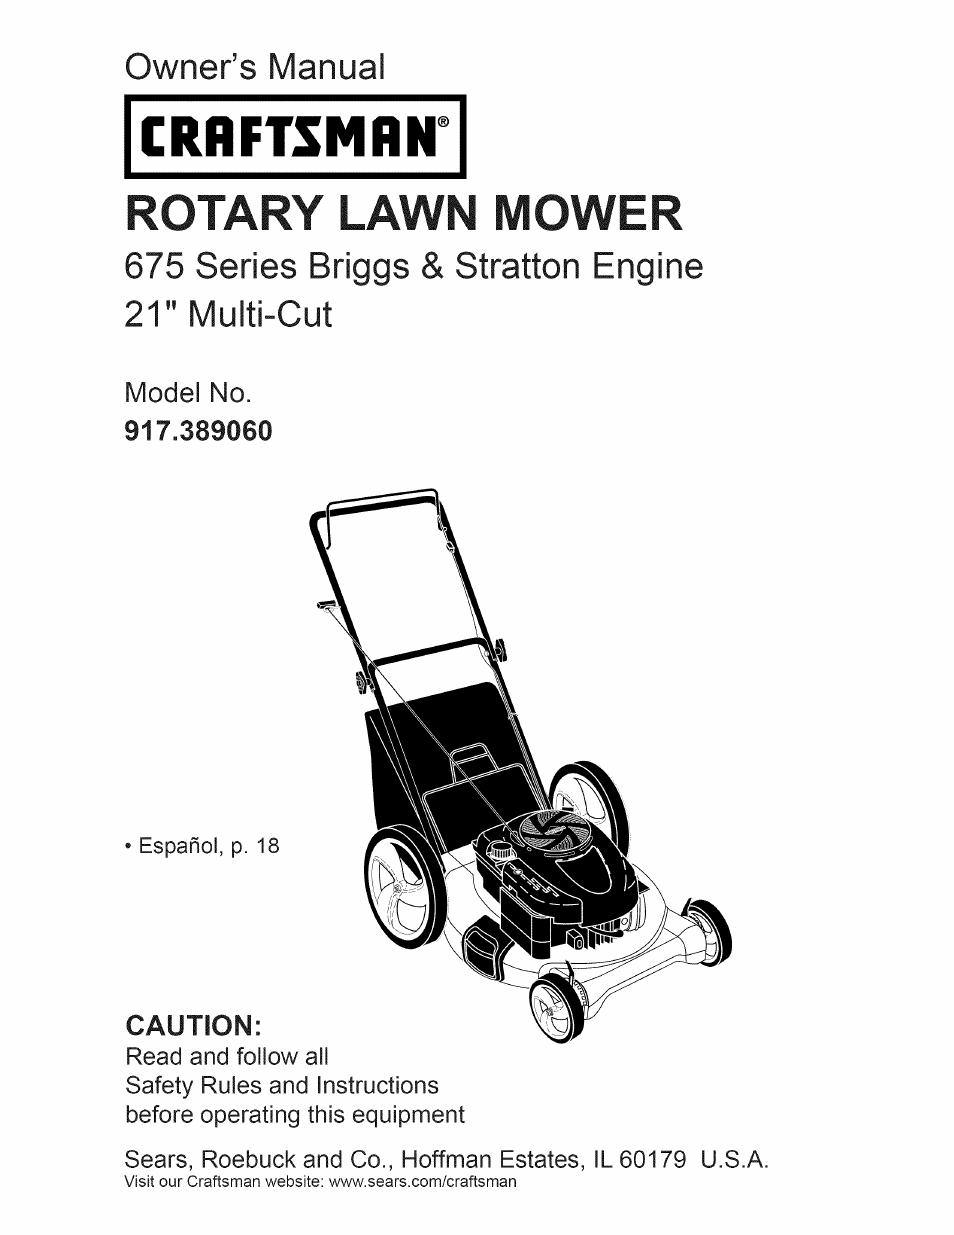 craftsman 917 389060 user manual 44 pages rh manualsdir com craftsman 675 lawn mower parts craftsman 675 series lawn mower parts